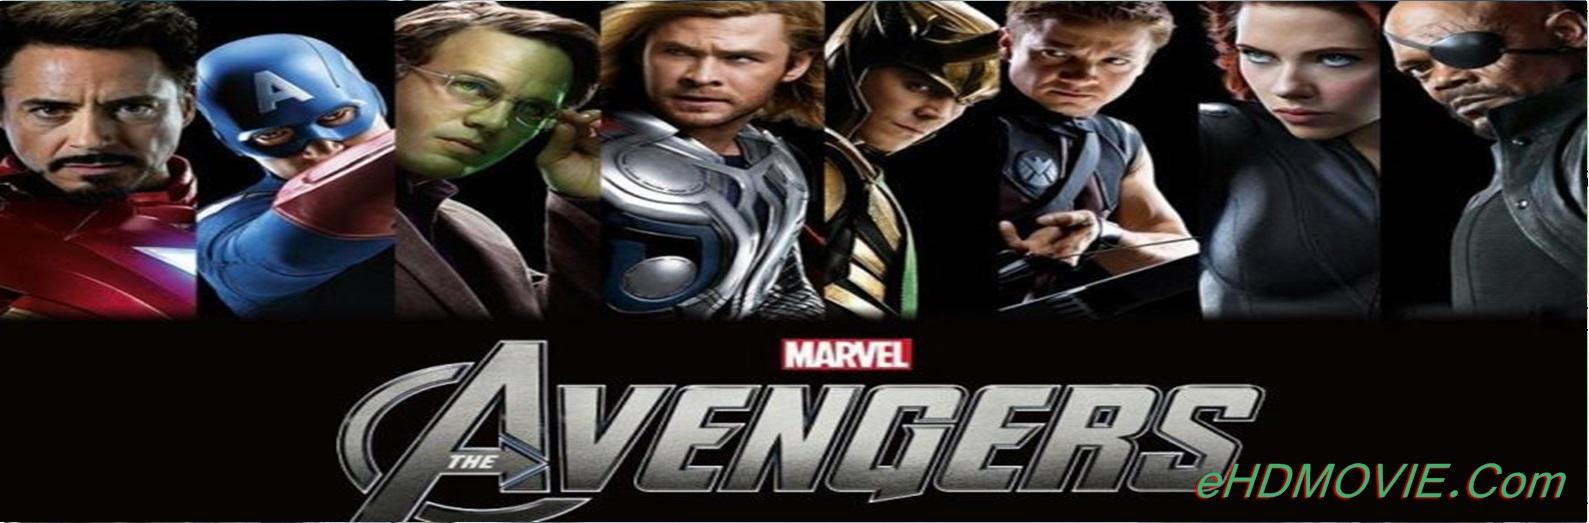 The Avengers 2012 Full Movie Dual Audio [Hindi – English] 1080p - 720p - 480p ORG BRRip 450MB - 1.1GB - 2.3GB ESubs Free Download